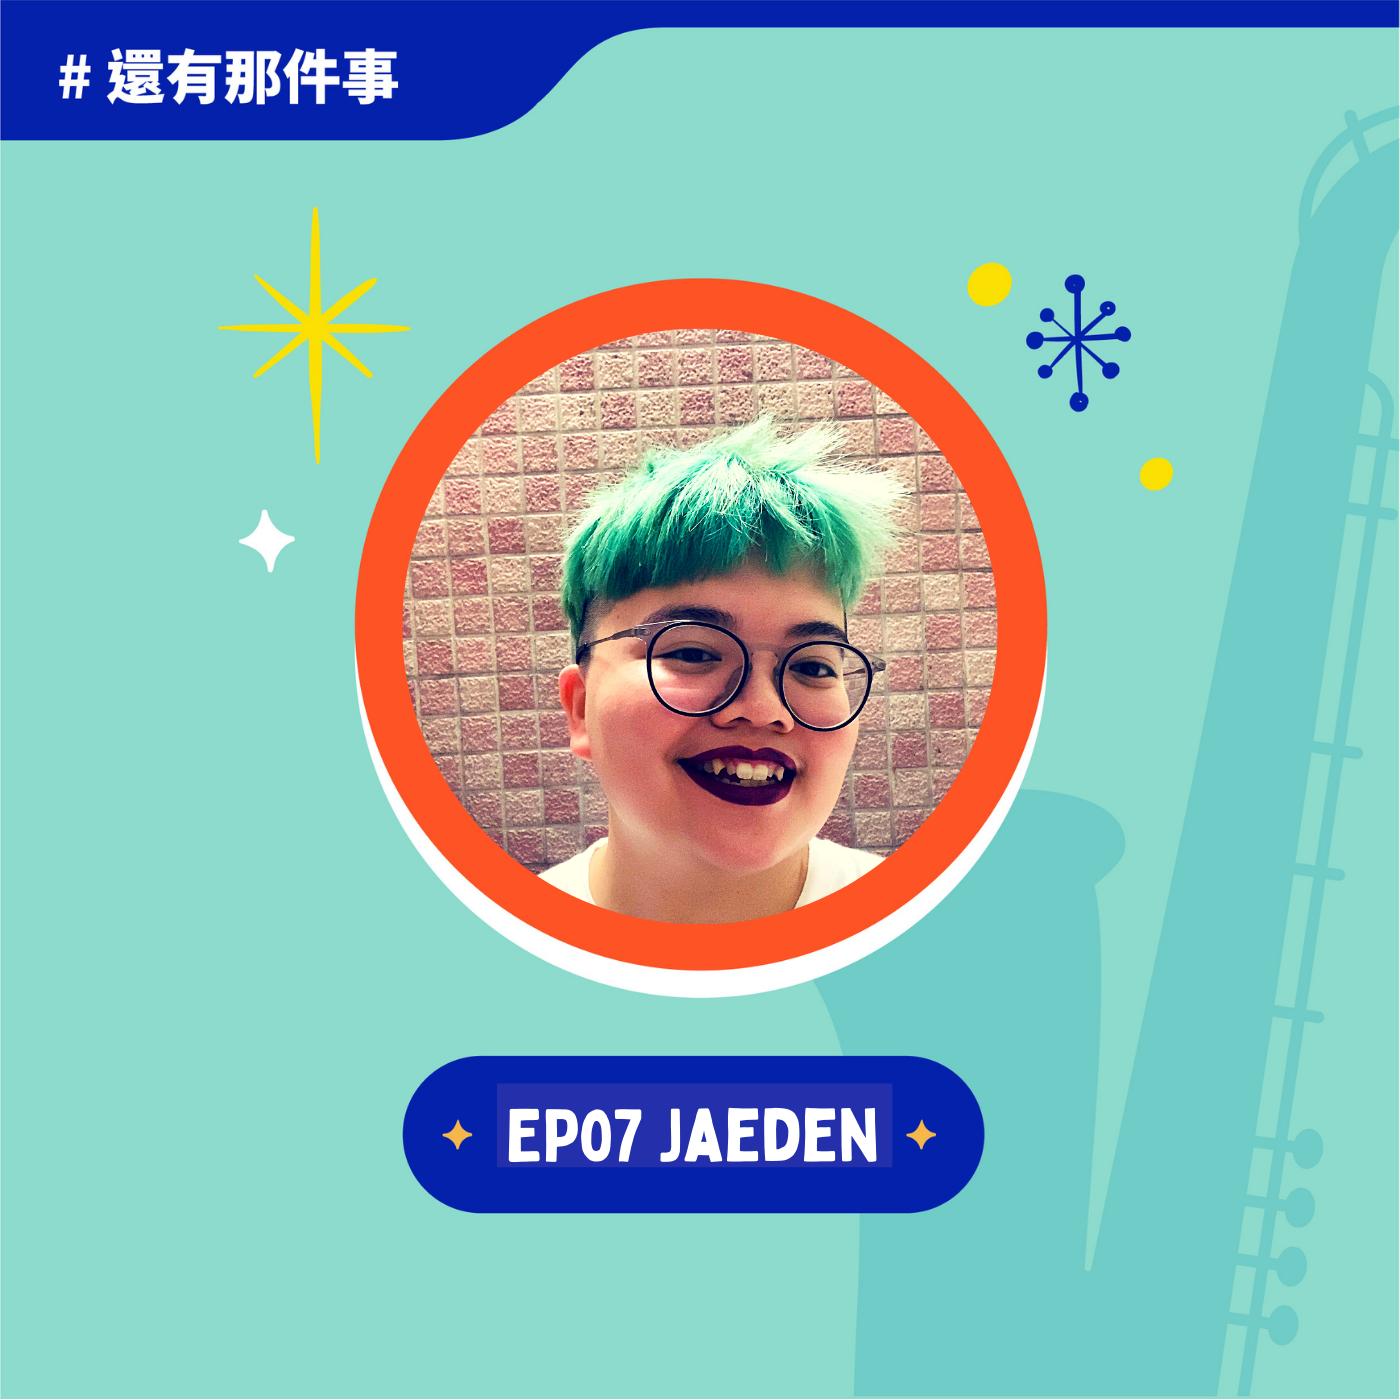 Pride Month 特別節目(01)ft. Jaeden|語言如何成為自我認同的避風港?泛性戀、酷兒、跨性別、非二元等標籤代表什麼?